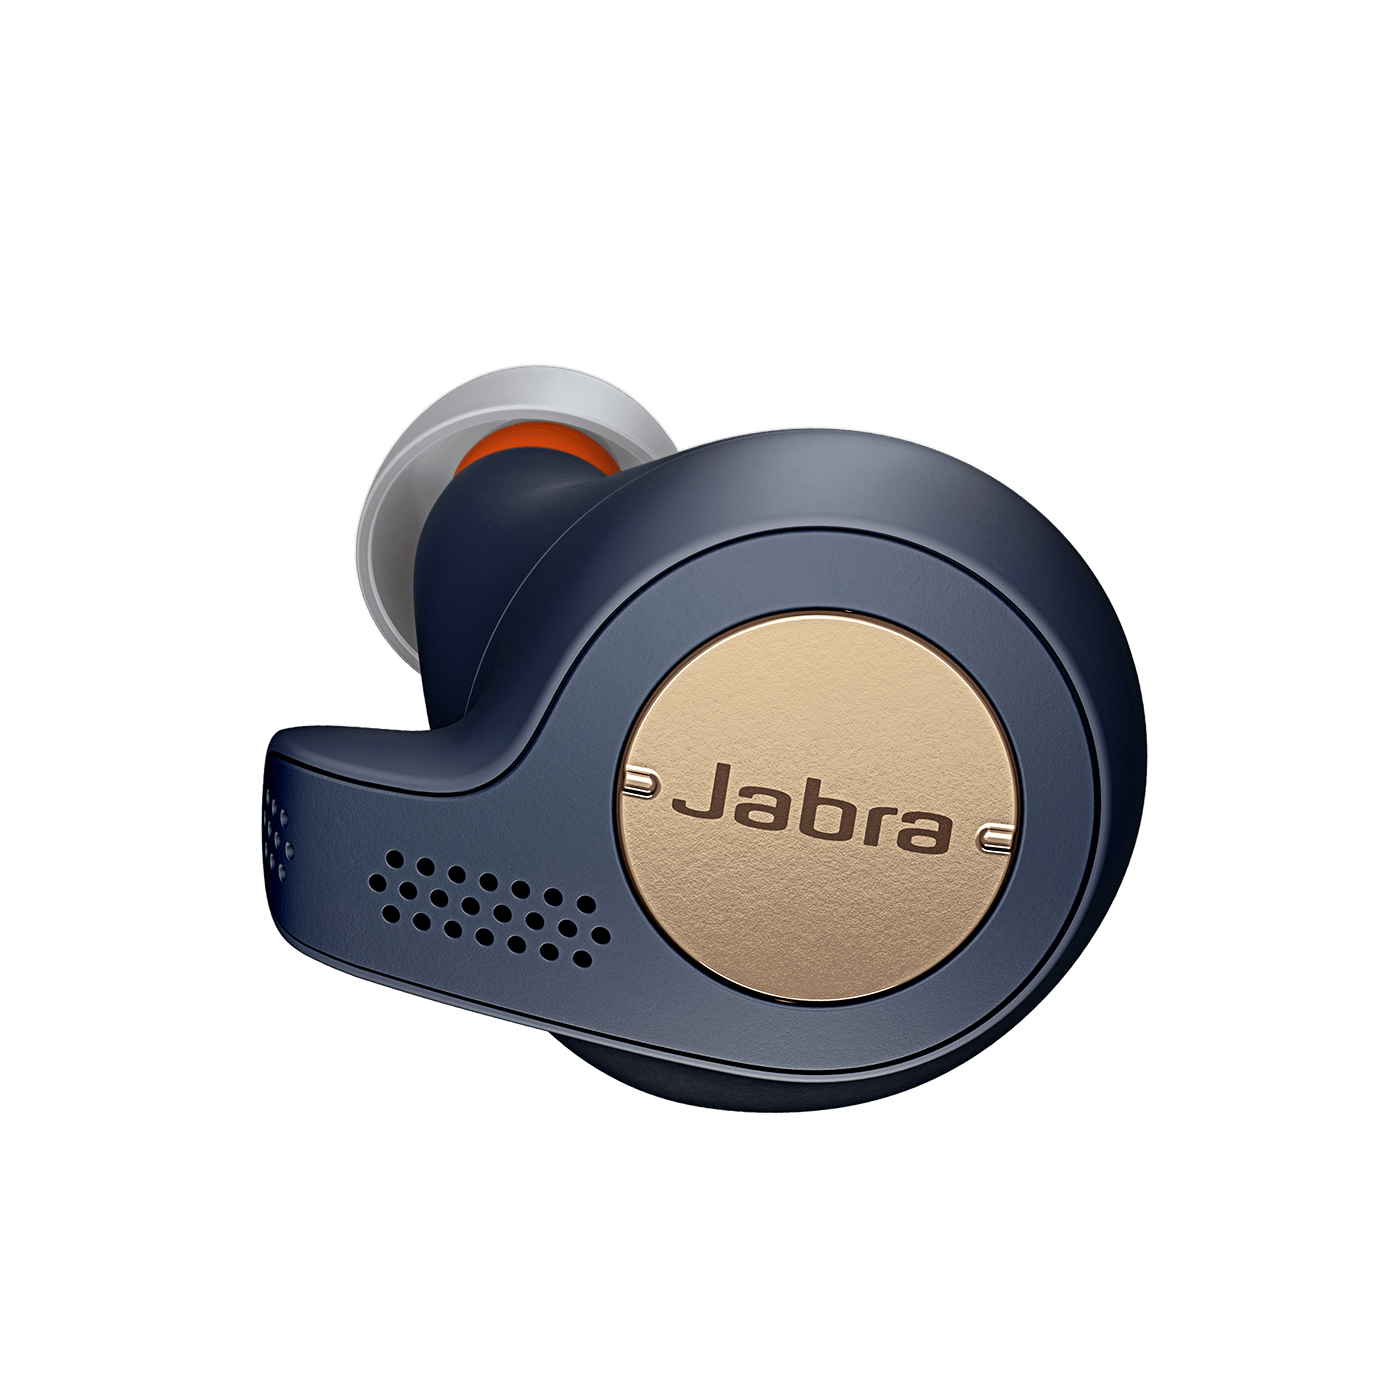 Jabra Elite Active 65t Left Earbud - Copper Blue